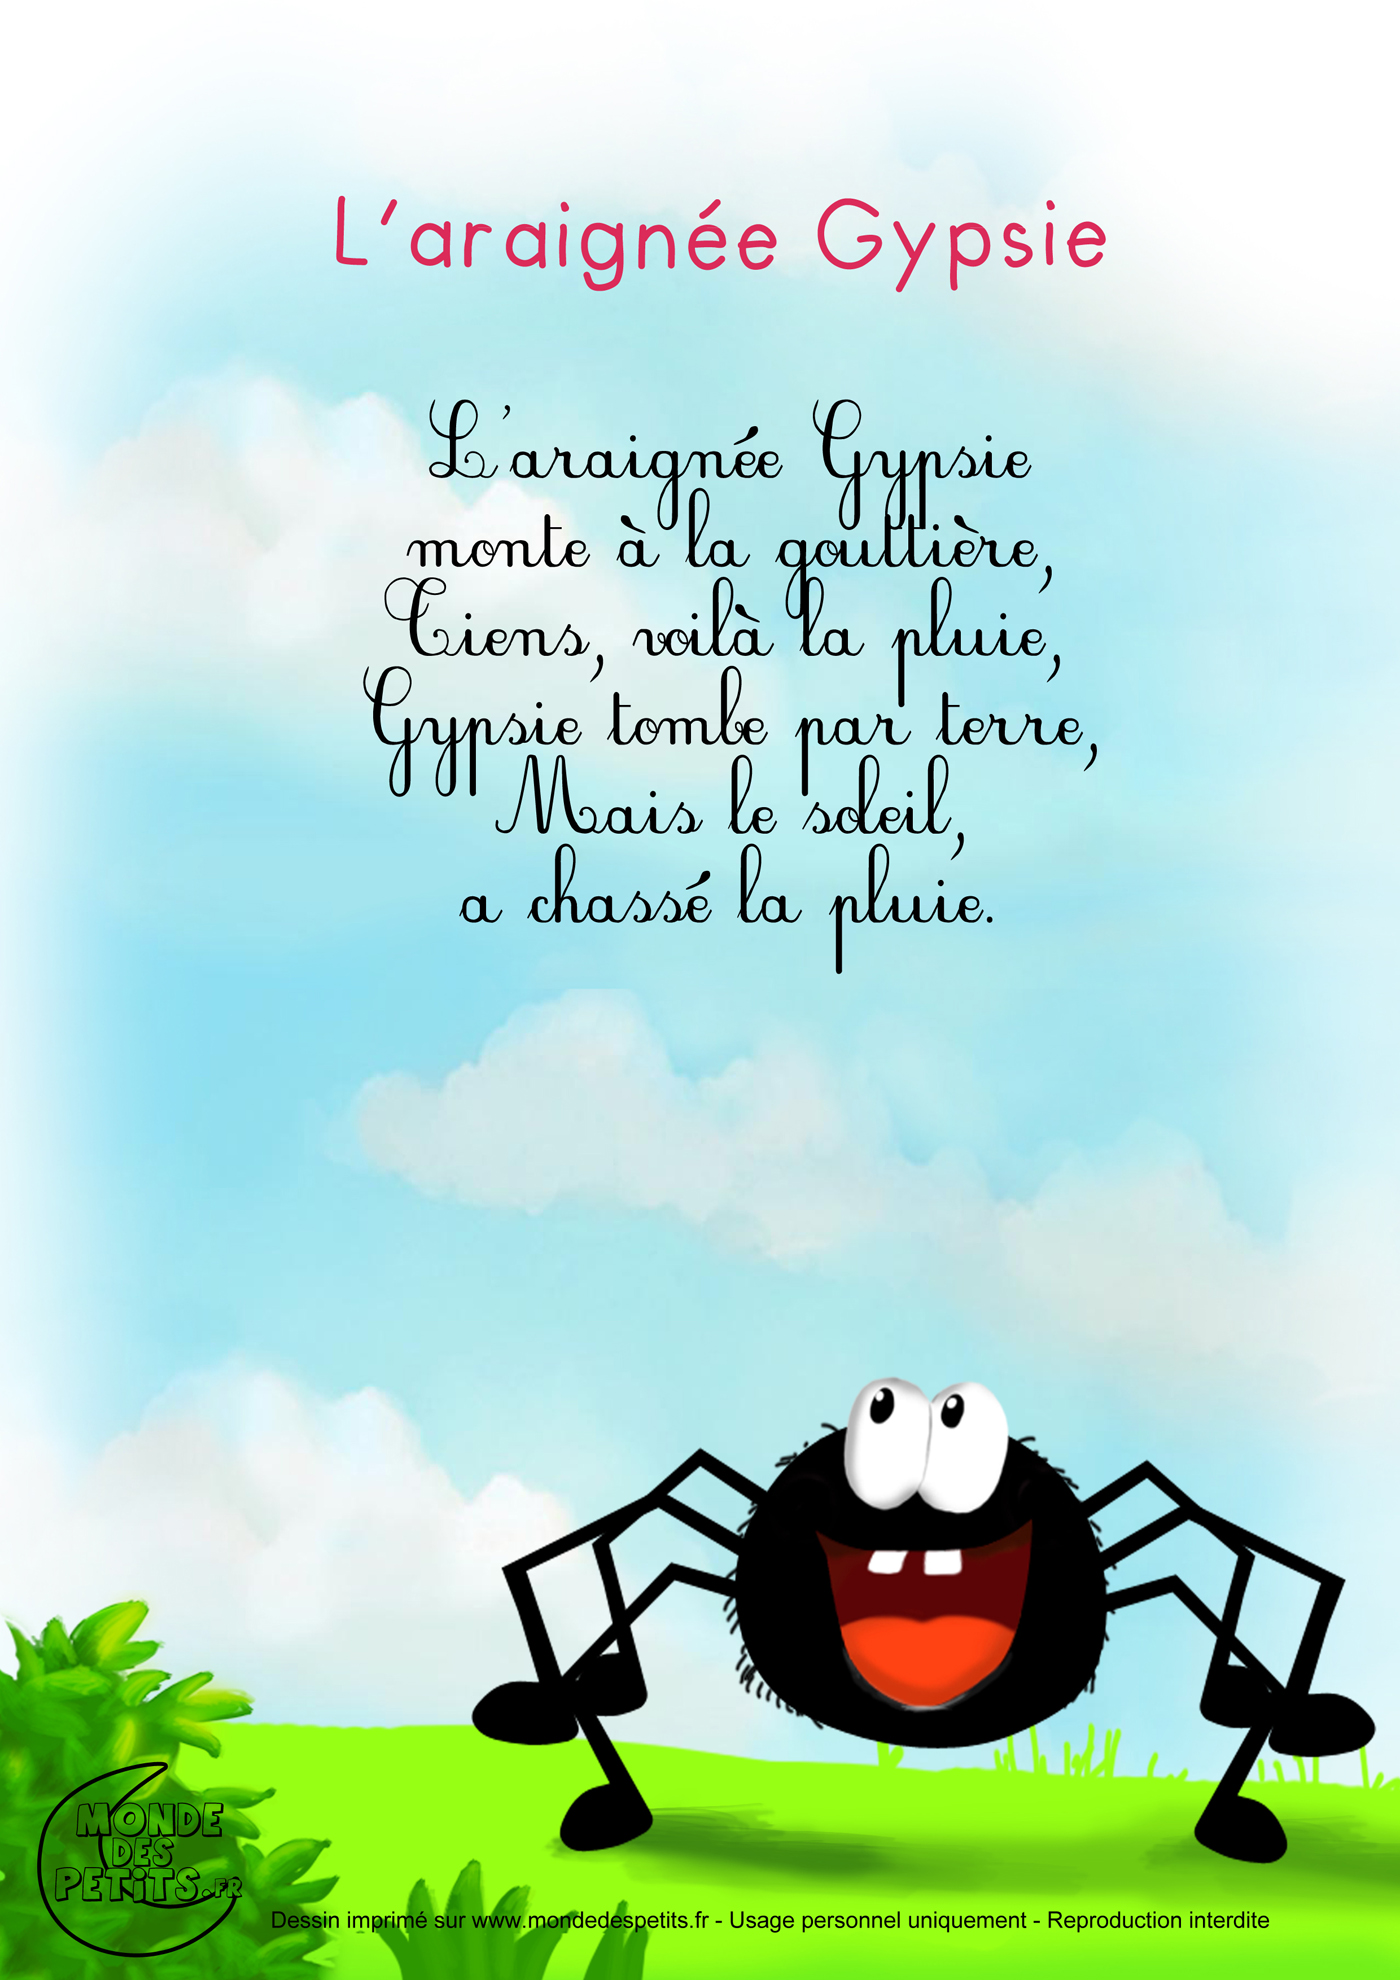 Araignée Gypsie 1